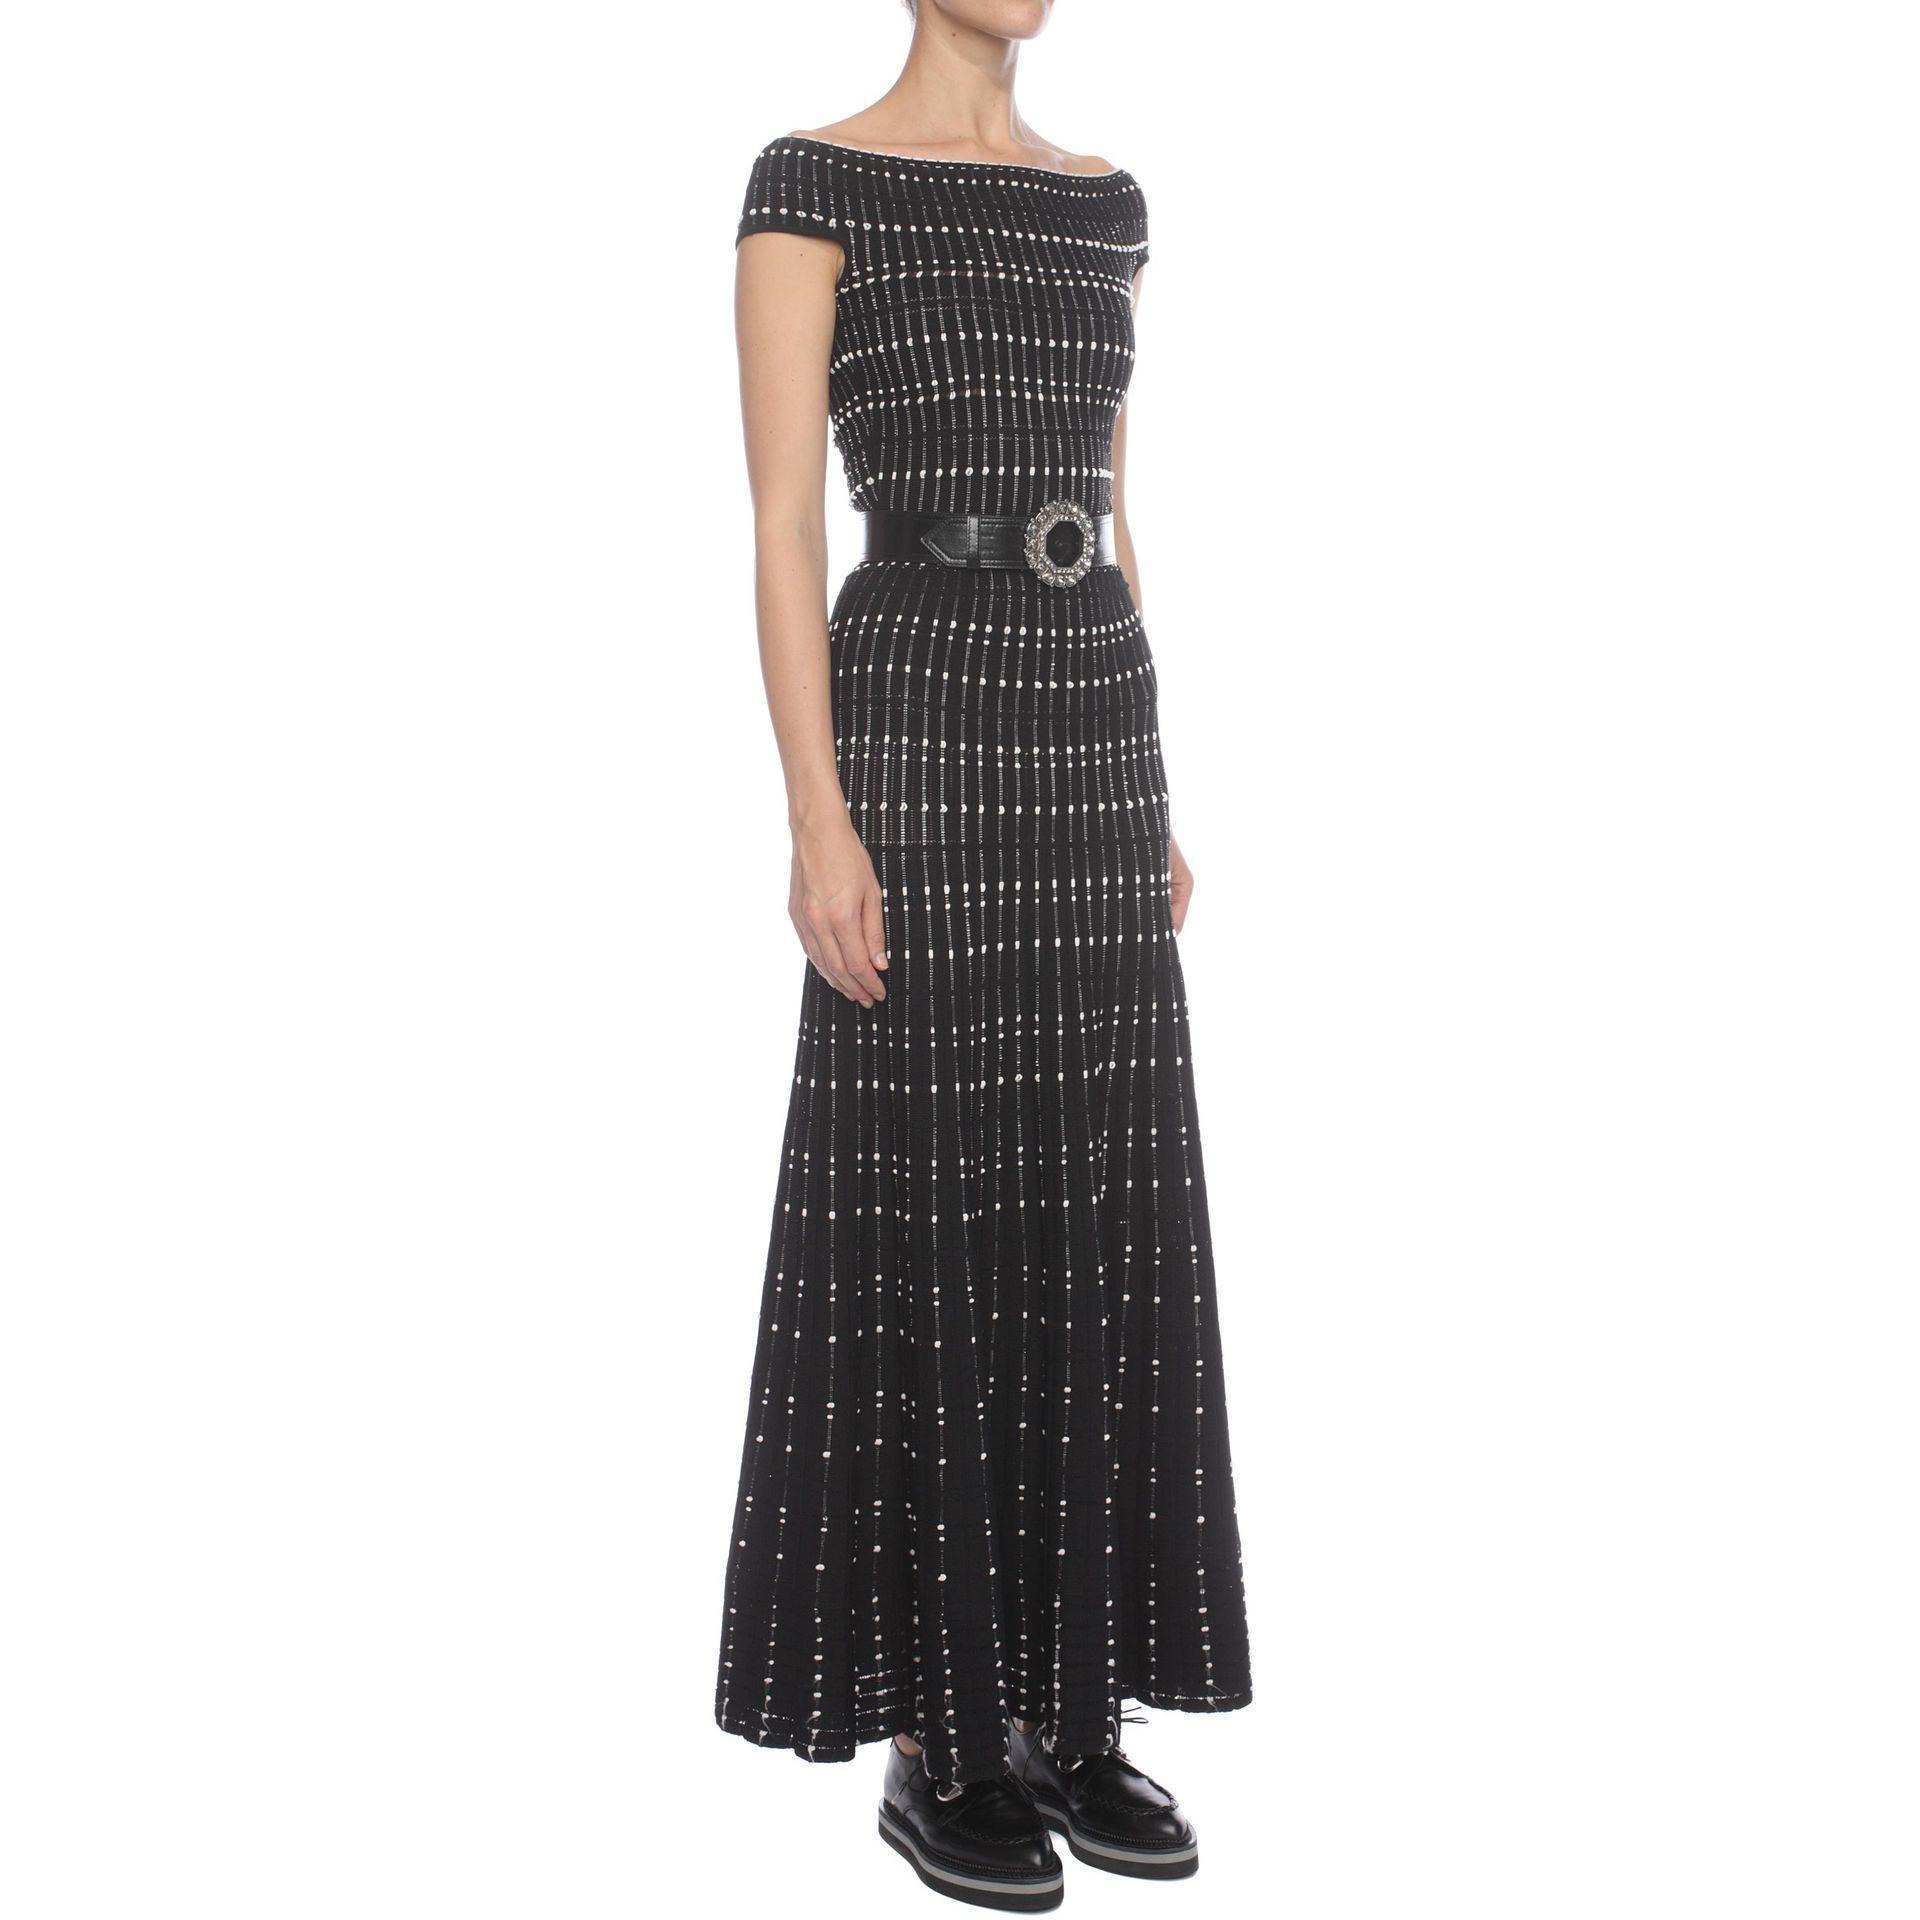 Alexander mcqueen Long Off Shoulder Knit Dress in Black  Lyst